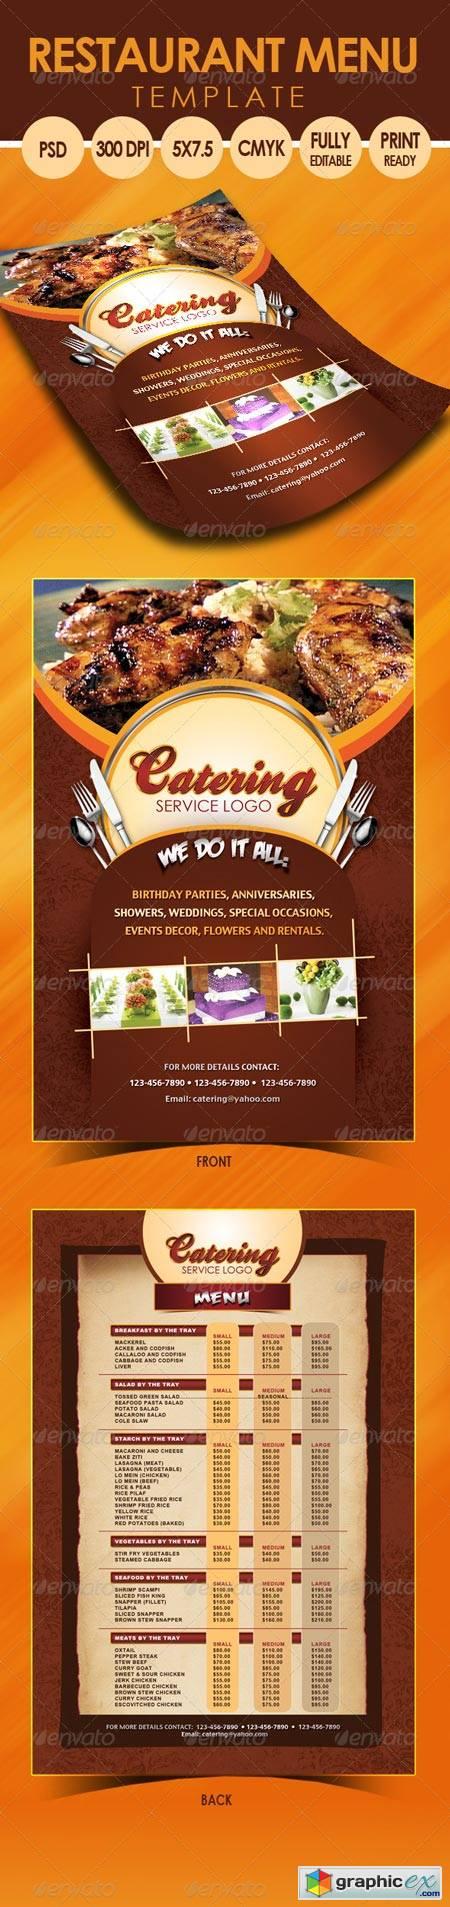 catering menu template free